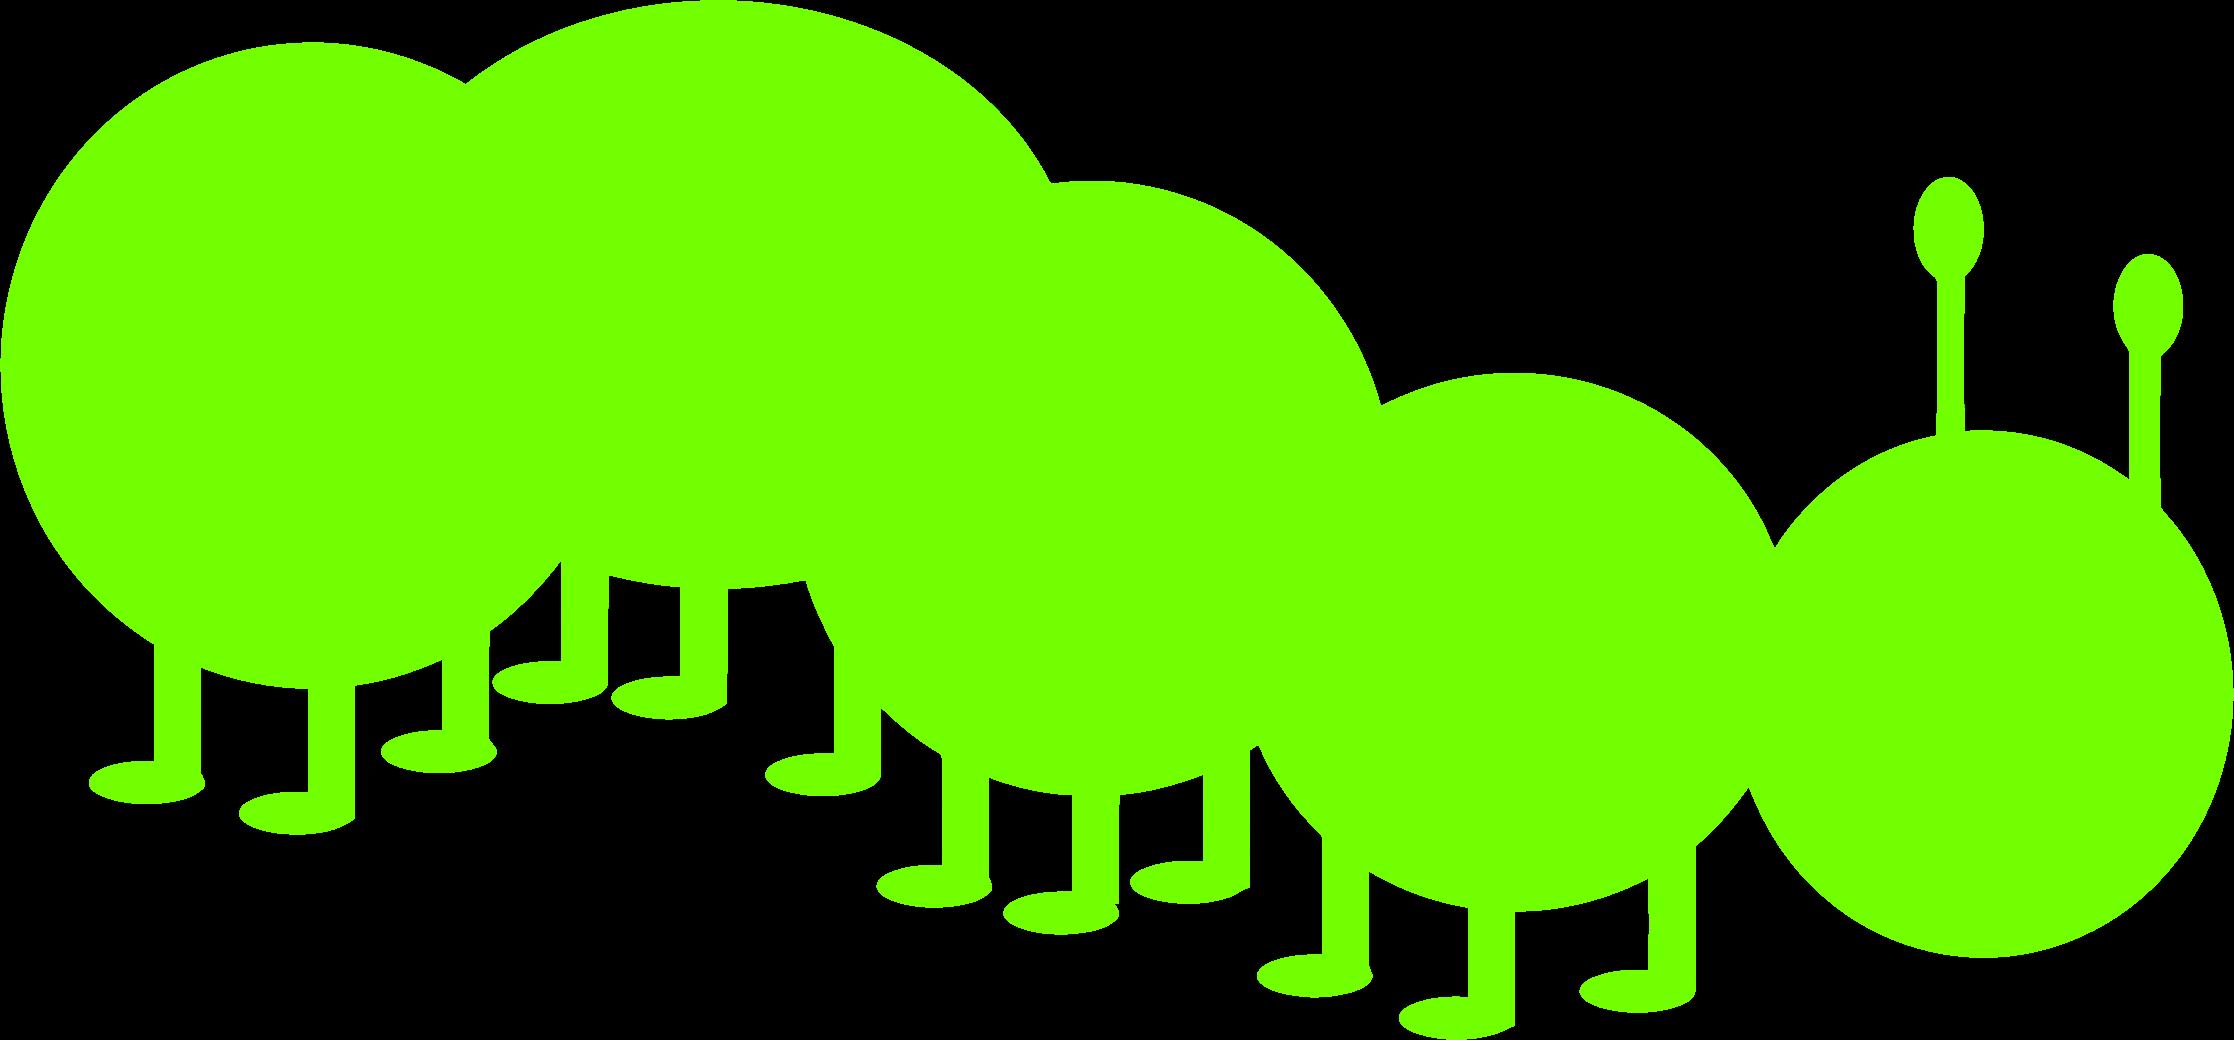 2234x1040 Caterpillar Logo Silhouette